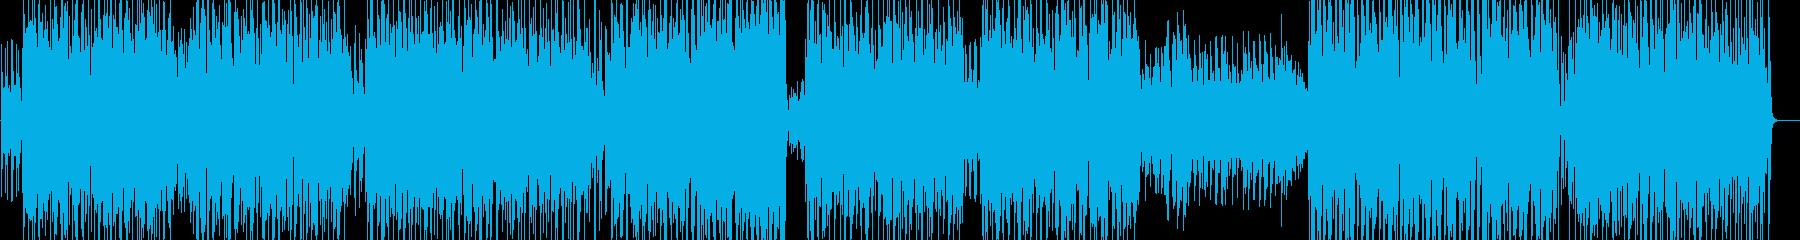 Roverの再生済みの波形